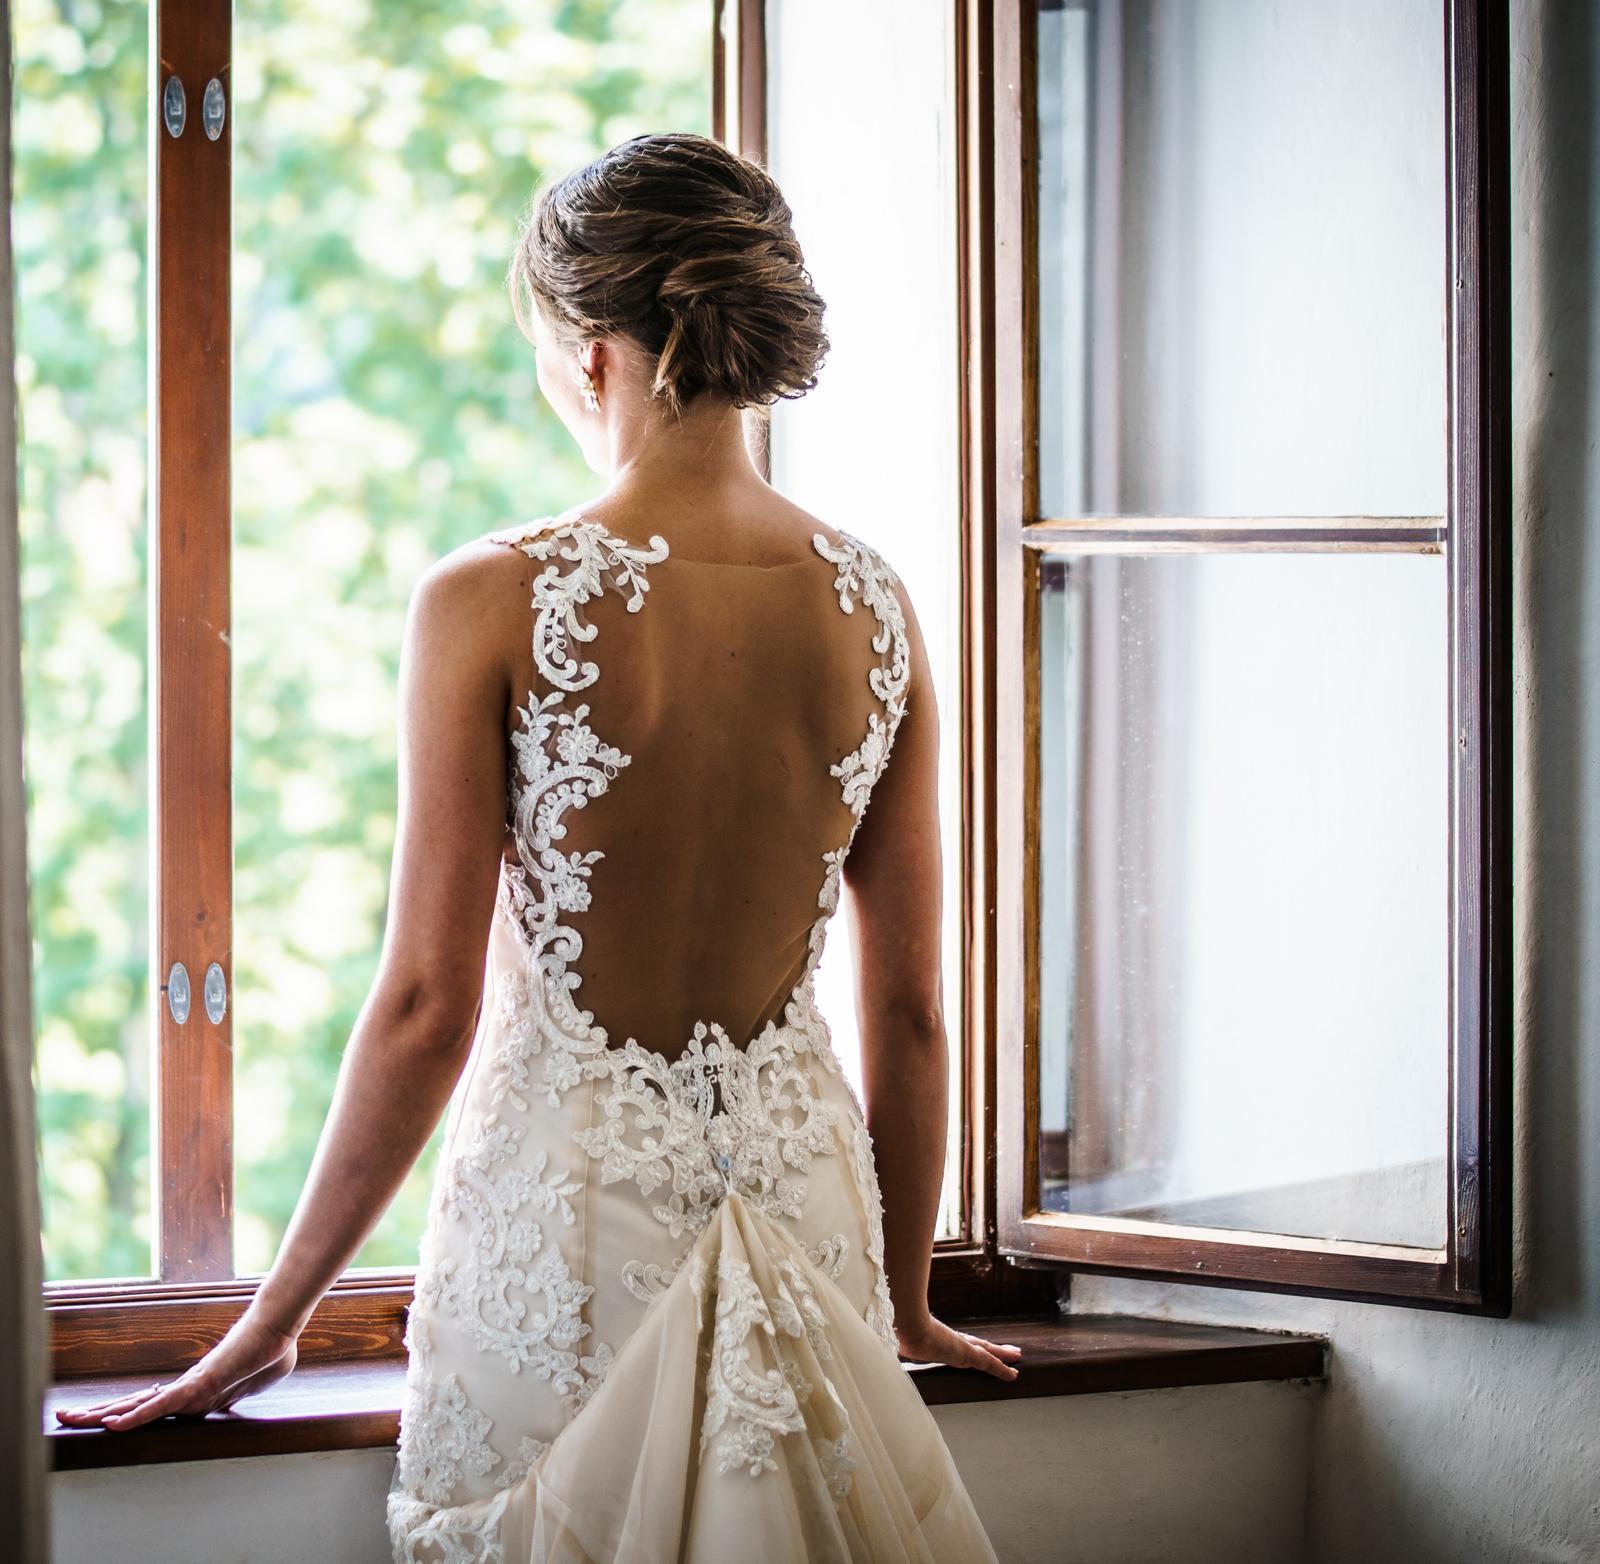 Svadobné šaty Milla Nova Amalia - Obrázok č. 1